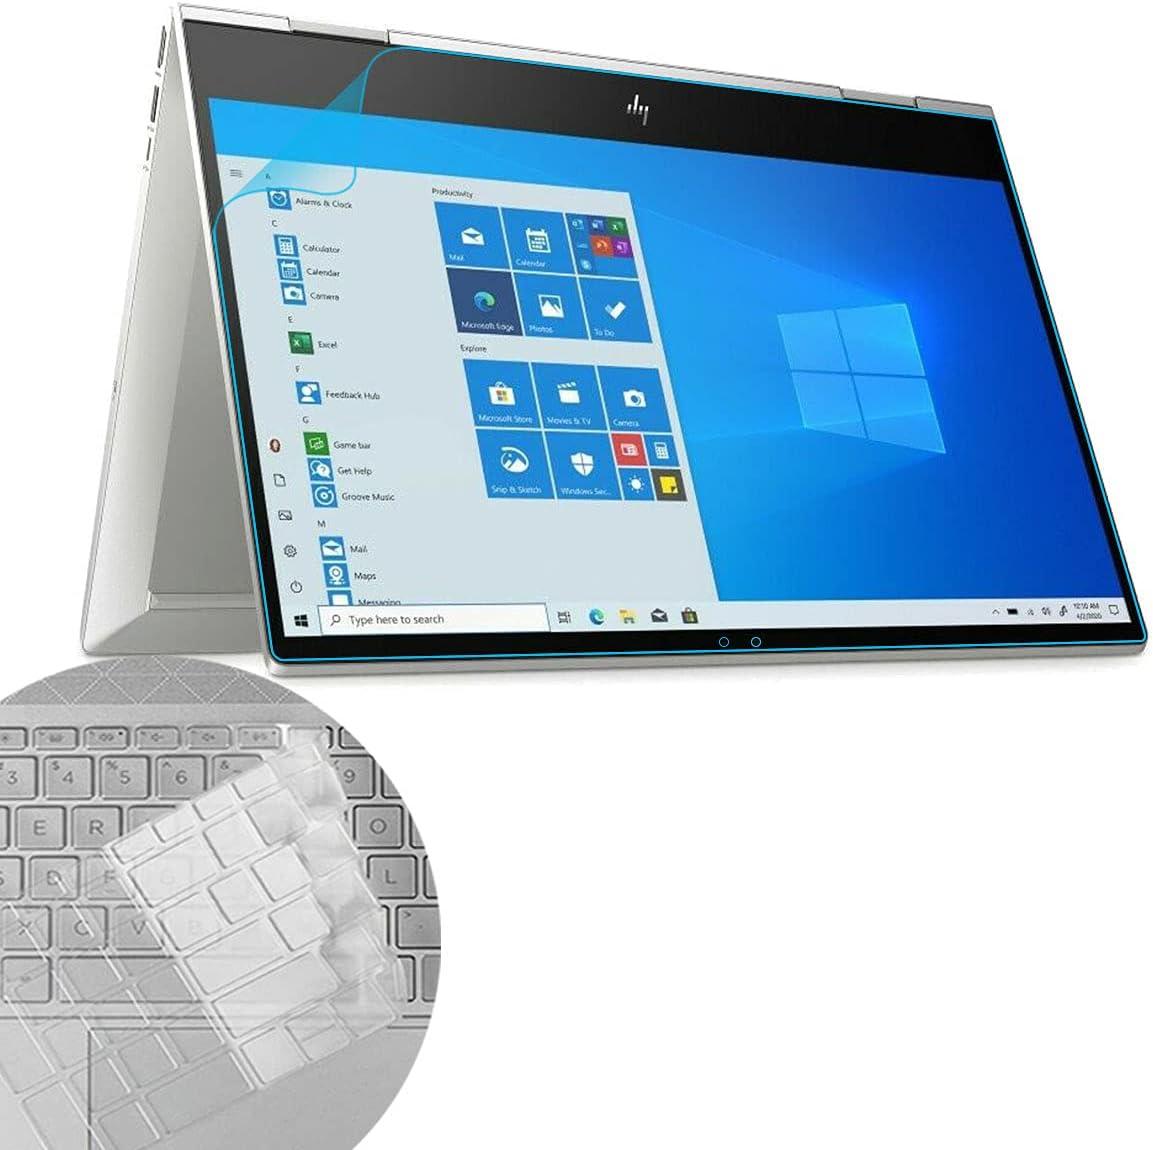 MUBUY for HP Envy 15m-ee 15-ee Series 15.6 Blue Light Screen Protector Filter, HP Envy X360 15m-ee0013dx ee0023dx 15-ee0047nr, etc. Full-Screen Protector & Keyboard Cover, Reduces Eye Strain